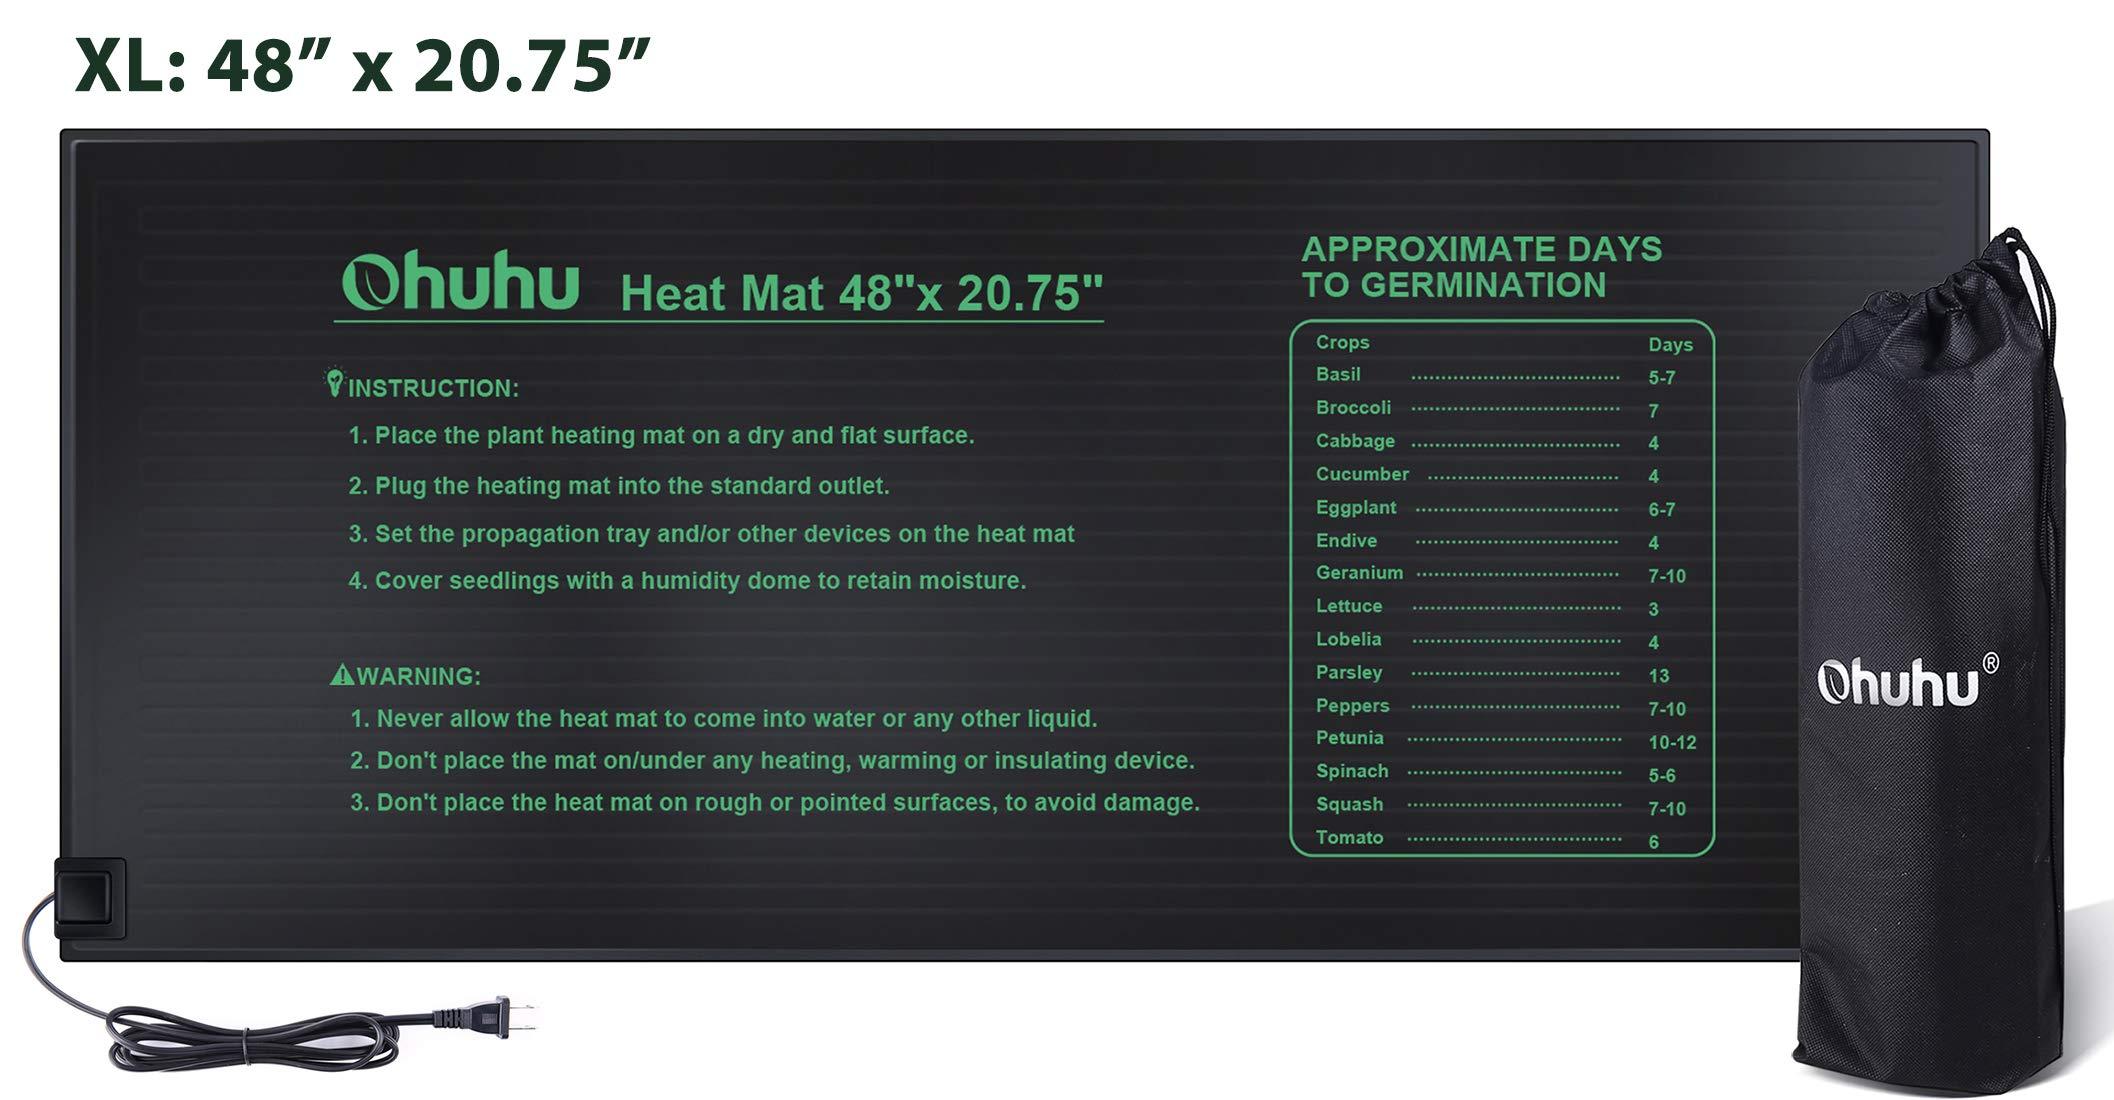 Ohuhu Plant Heating Pad, IP67 Waterproof Plant Warming Mat, MET Standard 18W Hydroponic Heating Mat for Indoor Seedling and Germination, 48'' x 20.75'', Bonus A Storage Bag